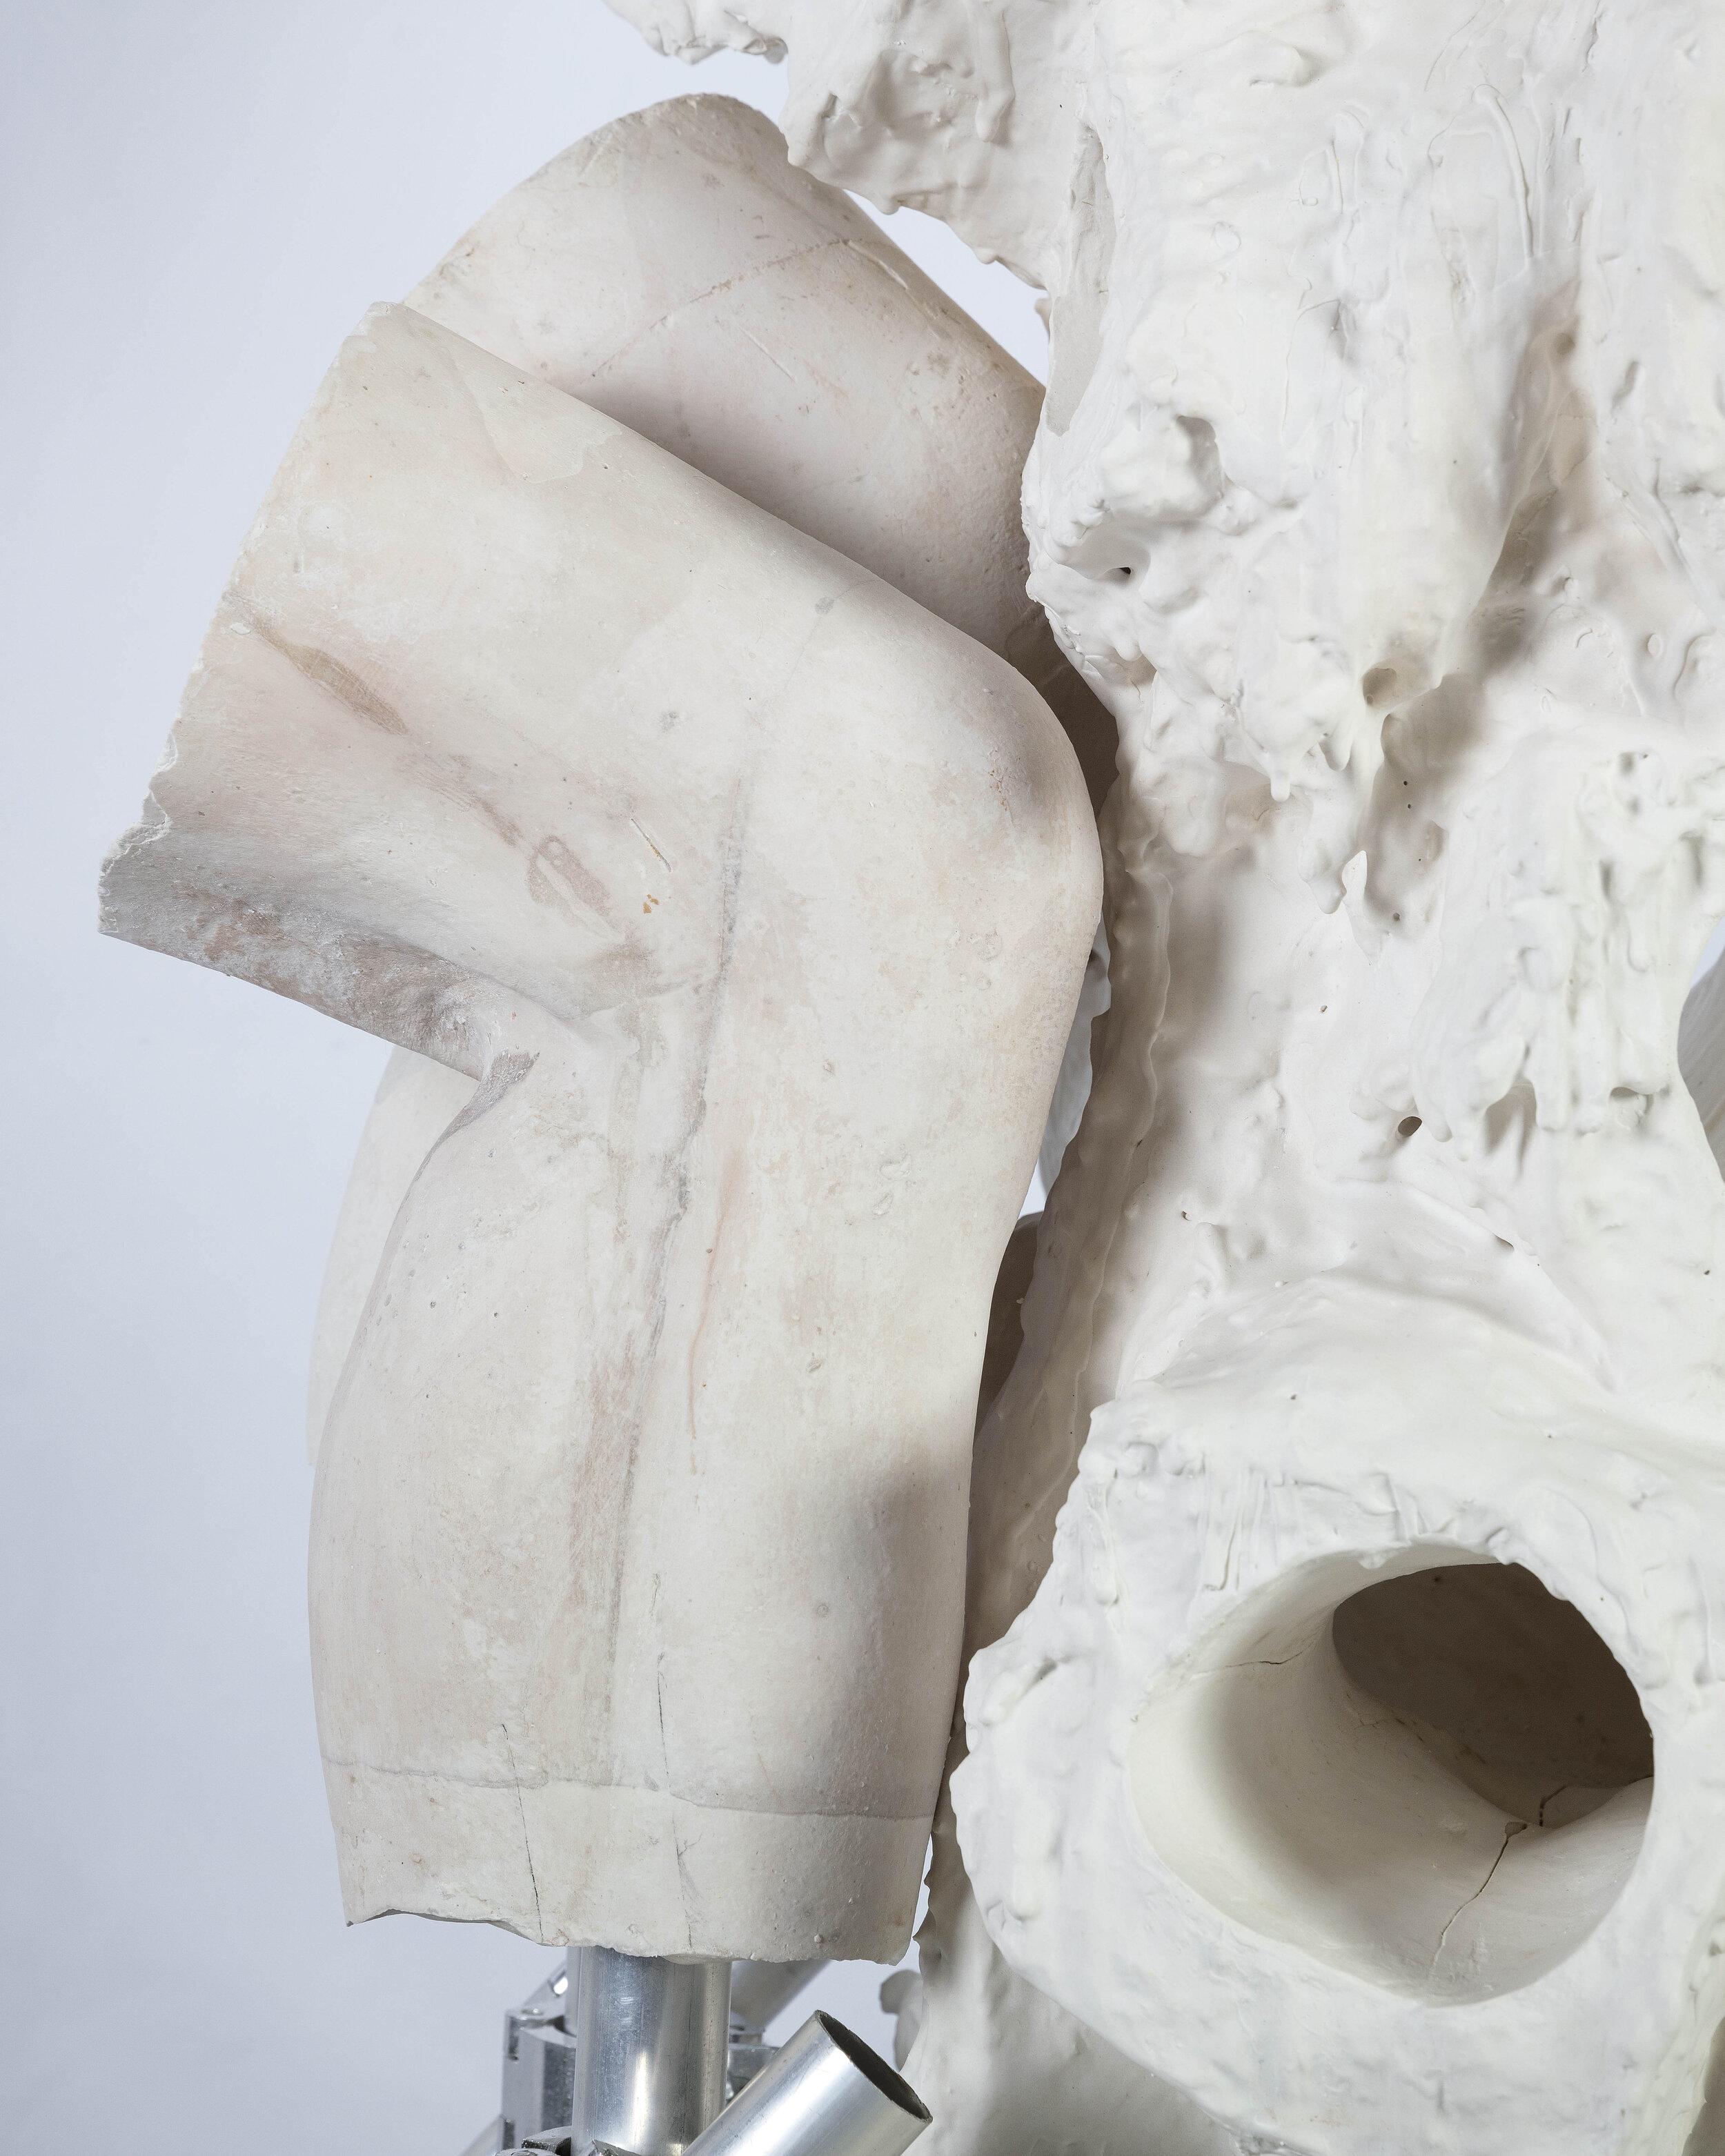 Contraction 3 (detail)   Dental plaster, steel, aluminium, acrylic, burlap, wax    160 x 80 x 50 cm    2019